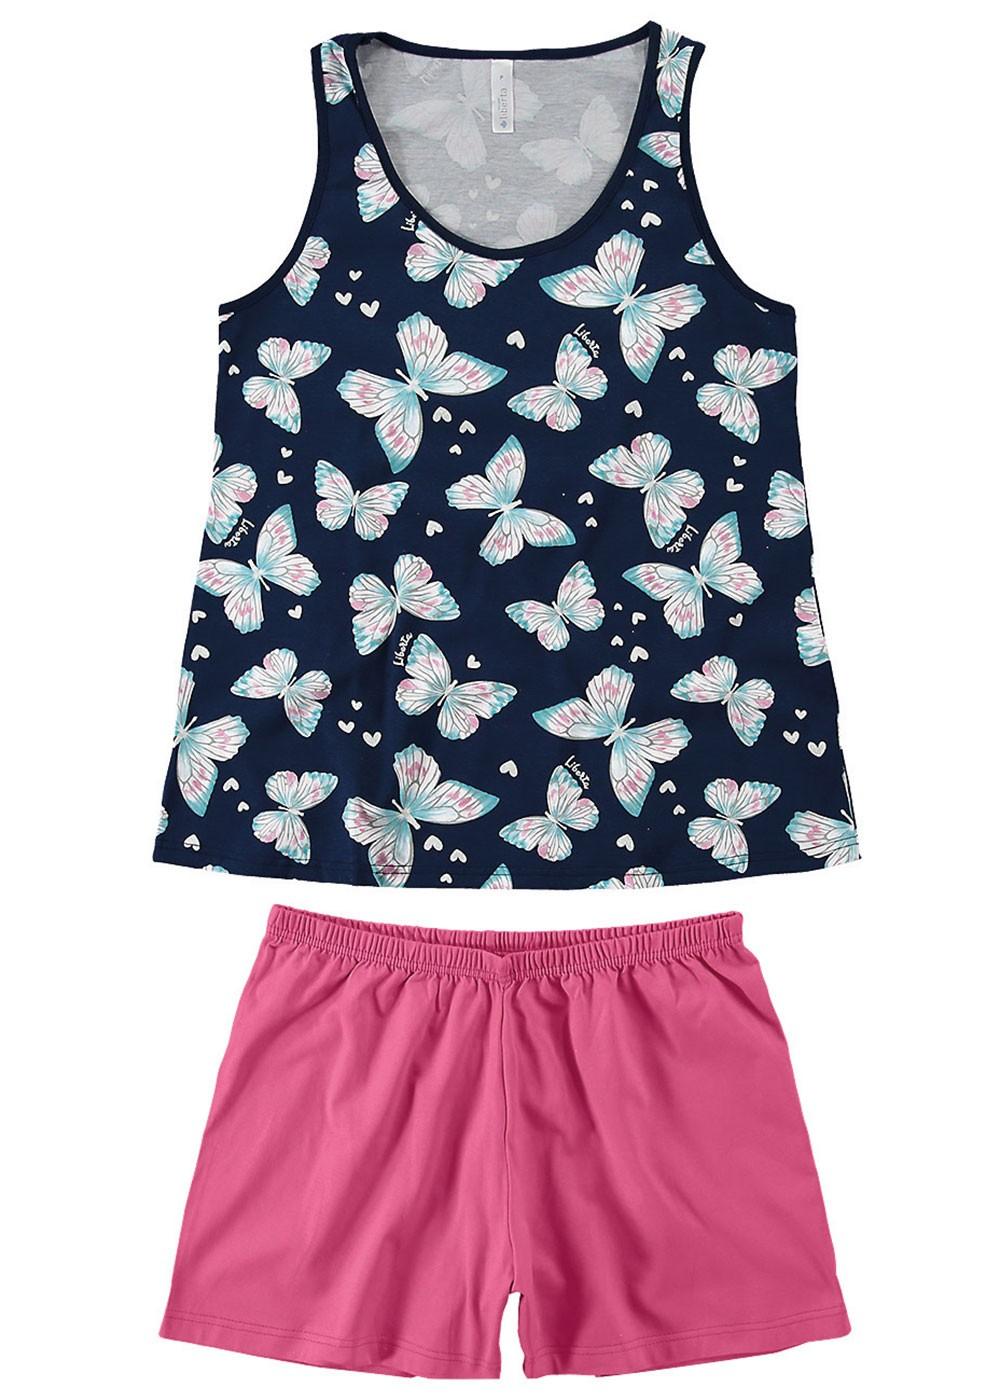 Pijama Feminino Mãe e Filha Short e Regata Azul Marinho Estampa Borboleta - Malwee